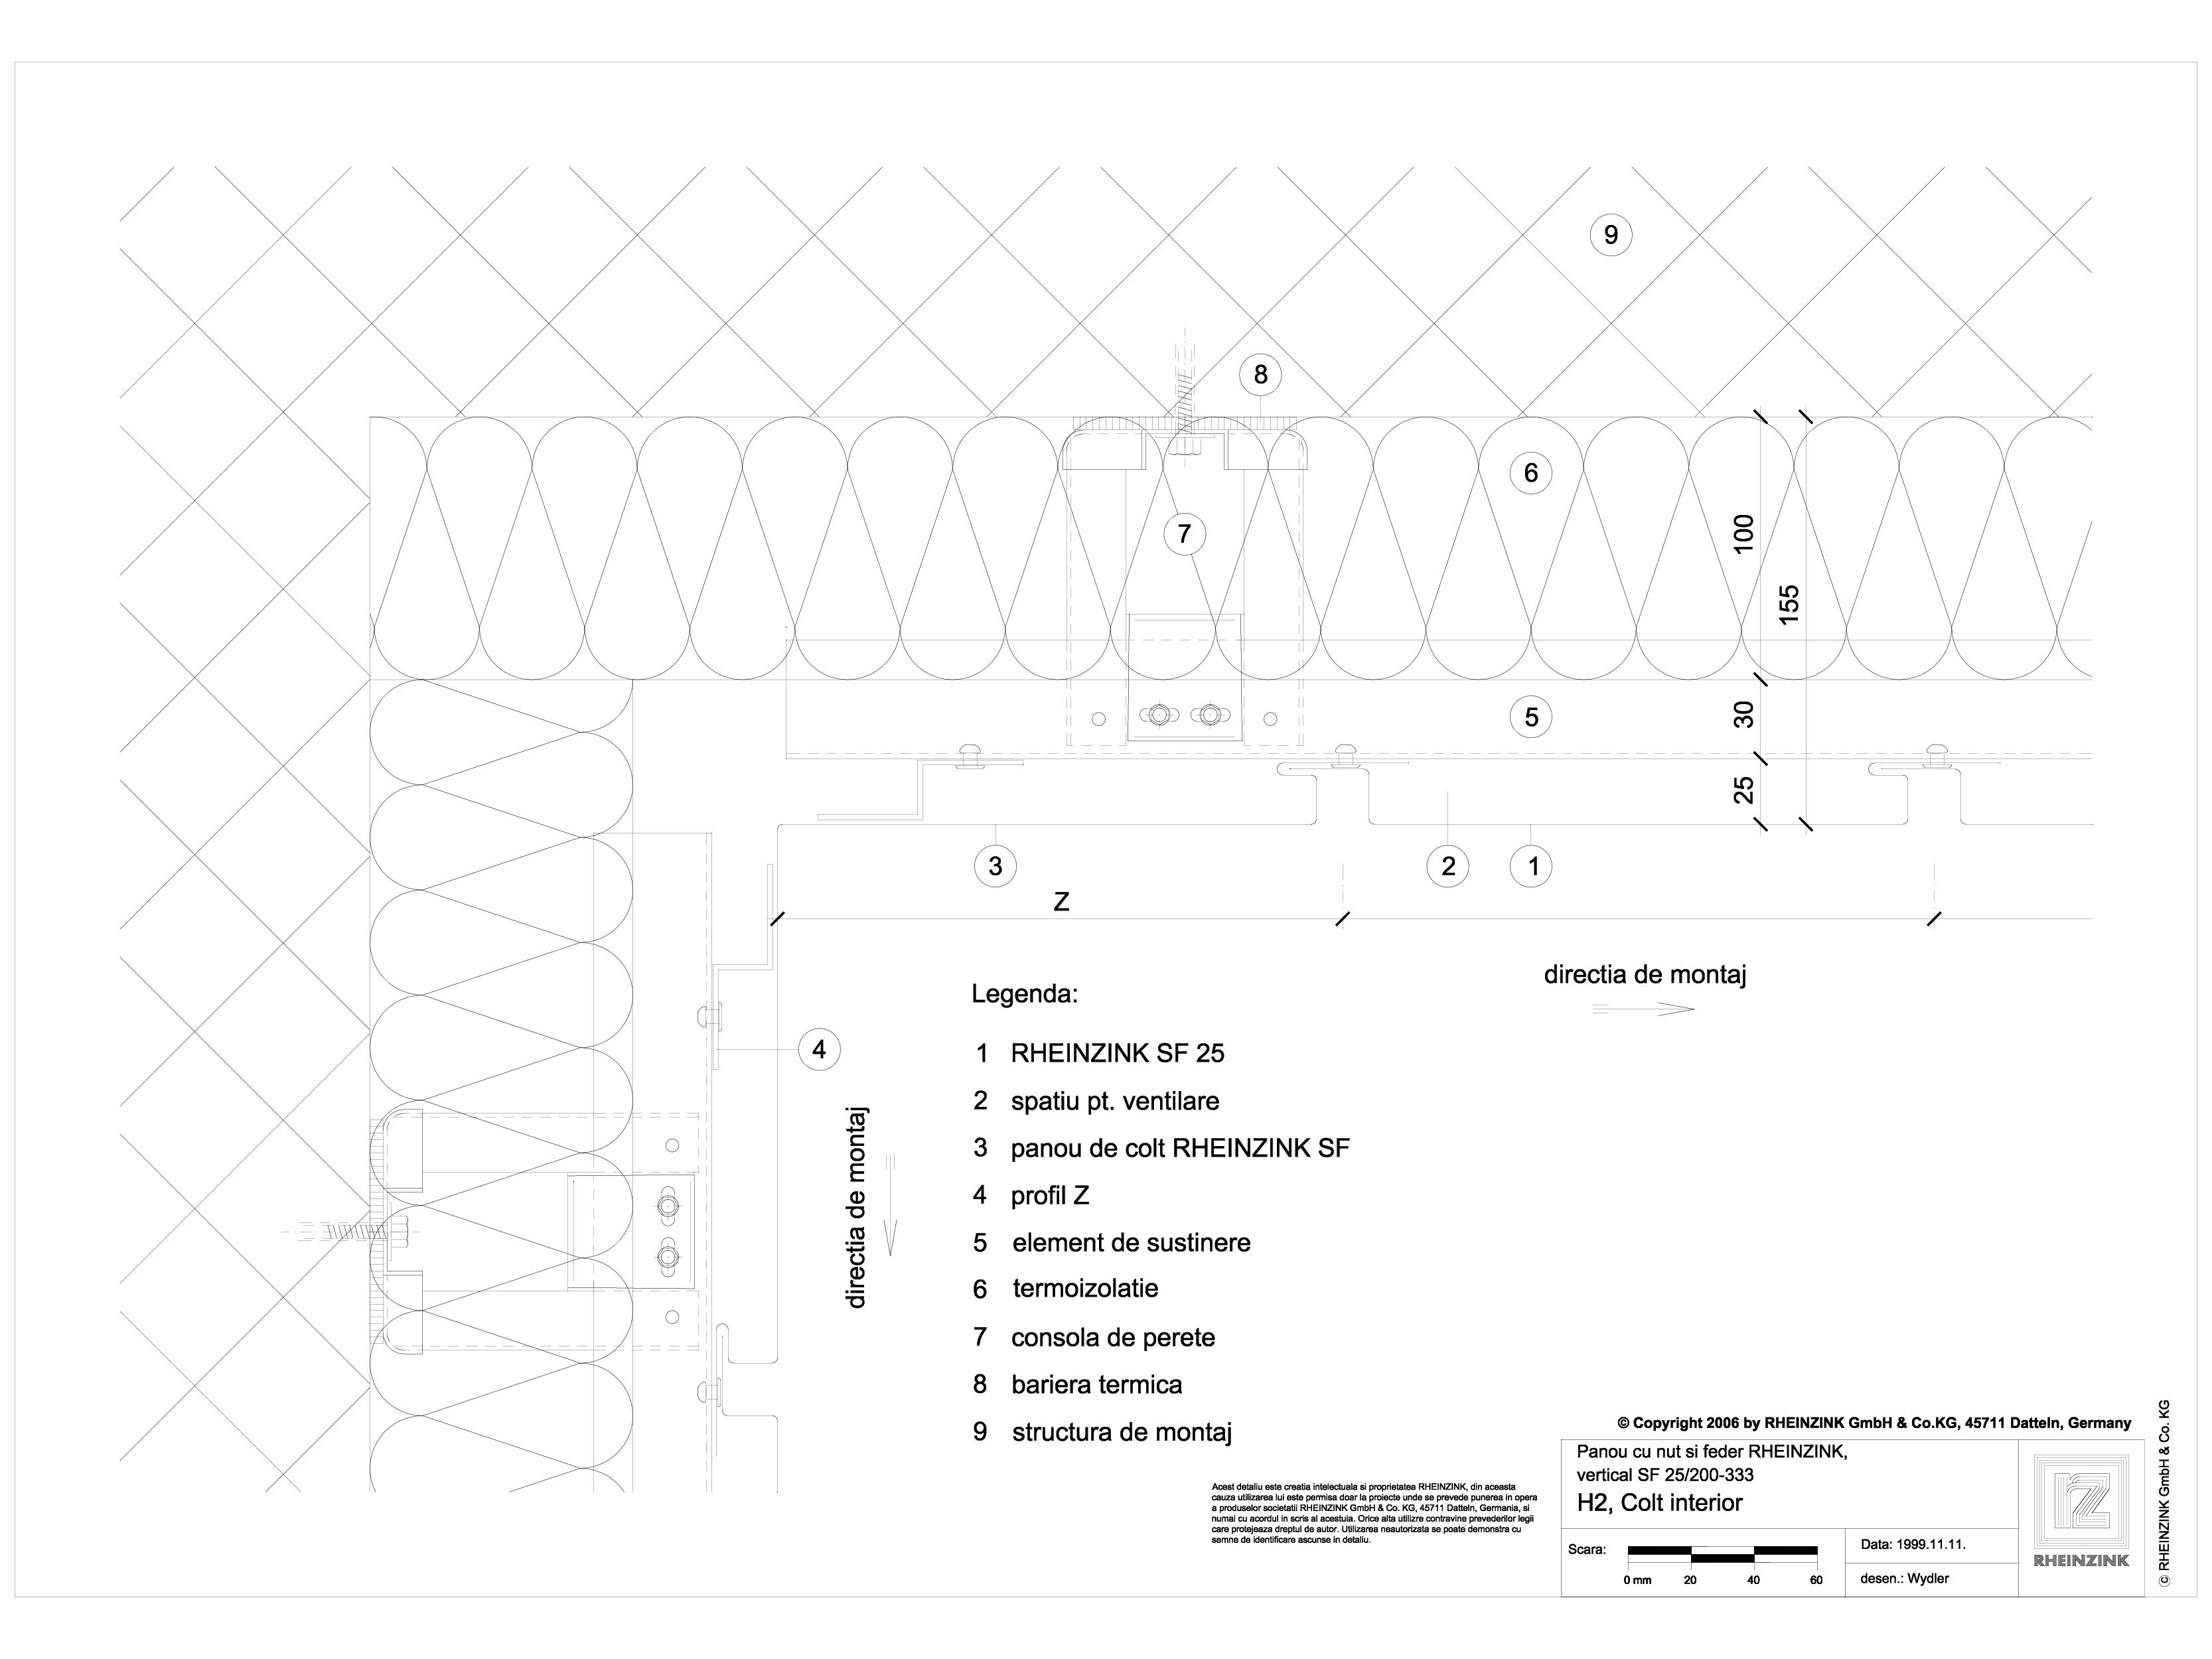 Pagina 1 - CAD-DWG Panou cu nut si feder - H2 Colt interior cu panou de colt RHEINZINK Detaliu de...